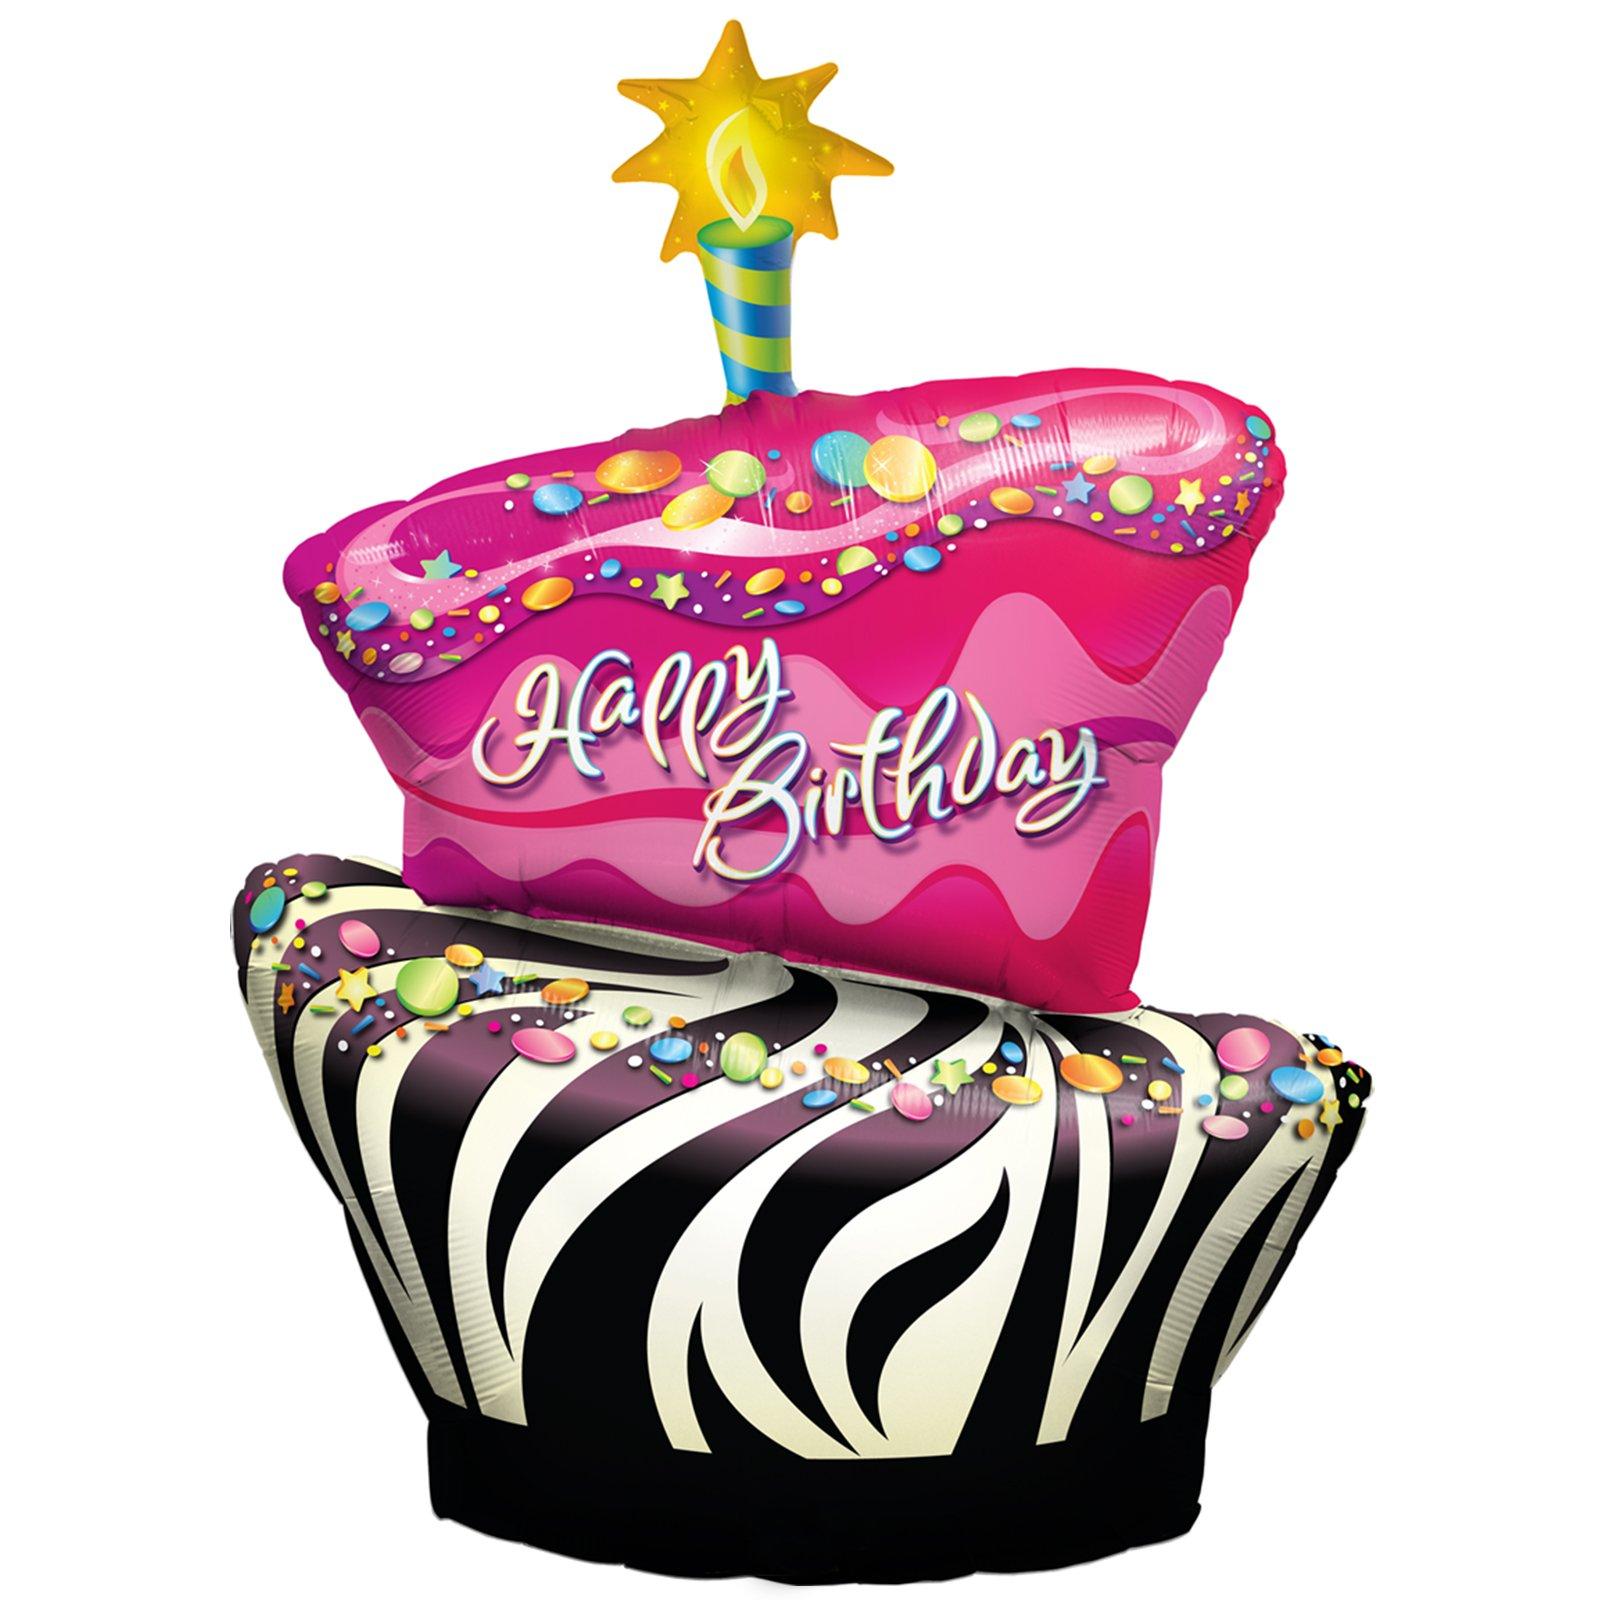 Vampire clipart birthday cake Of Cake cartoon Vector Happy